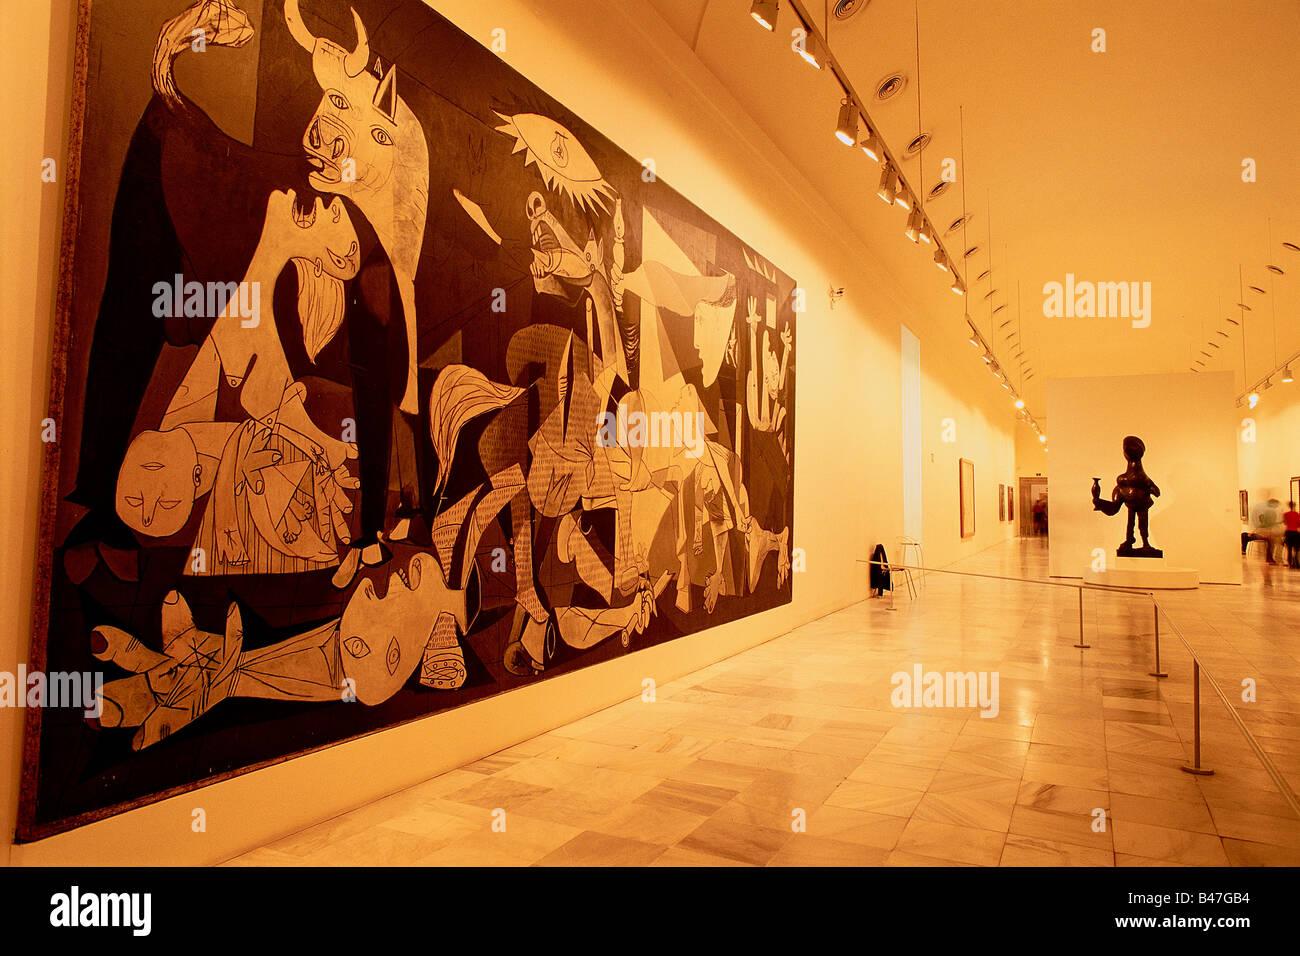 Spain - Madrid - Centro de Arte Reina Sofia - Queen Sofia Art Center - Museum of Modern 20th permanent room of exhibition - Stock Image